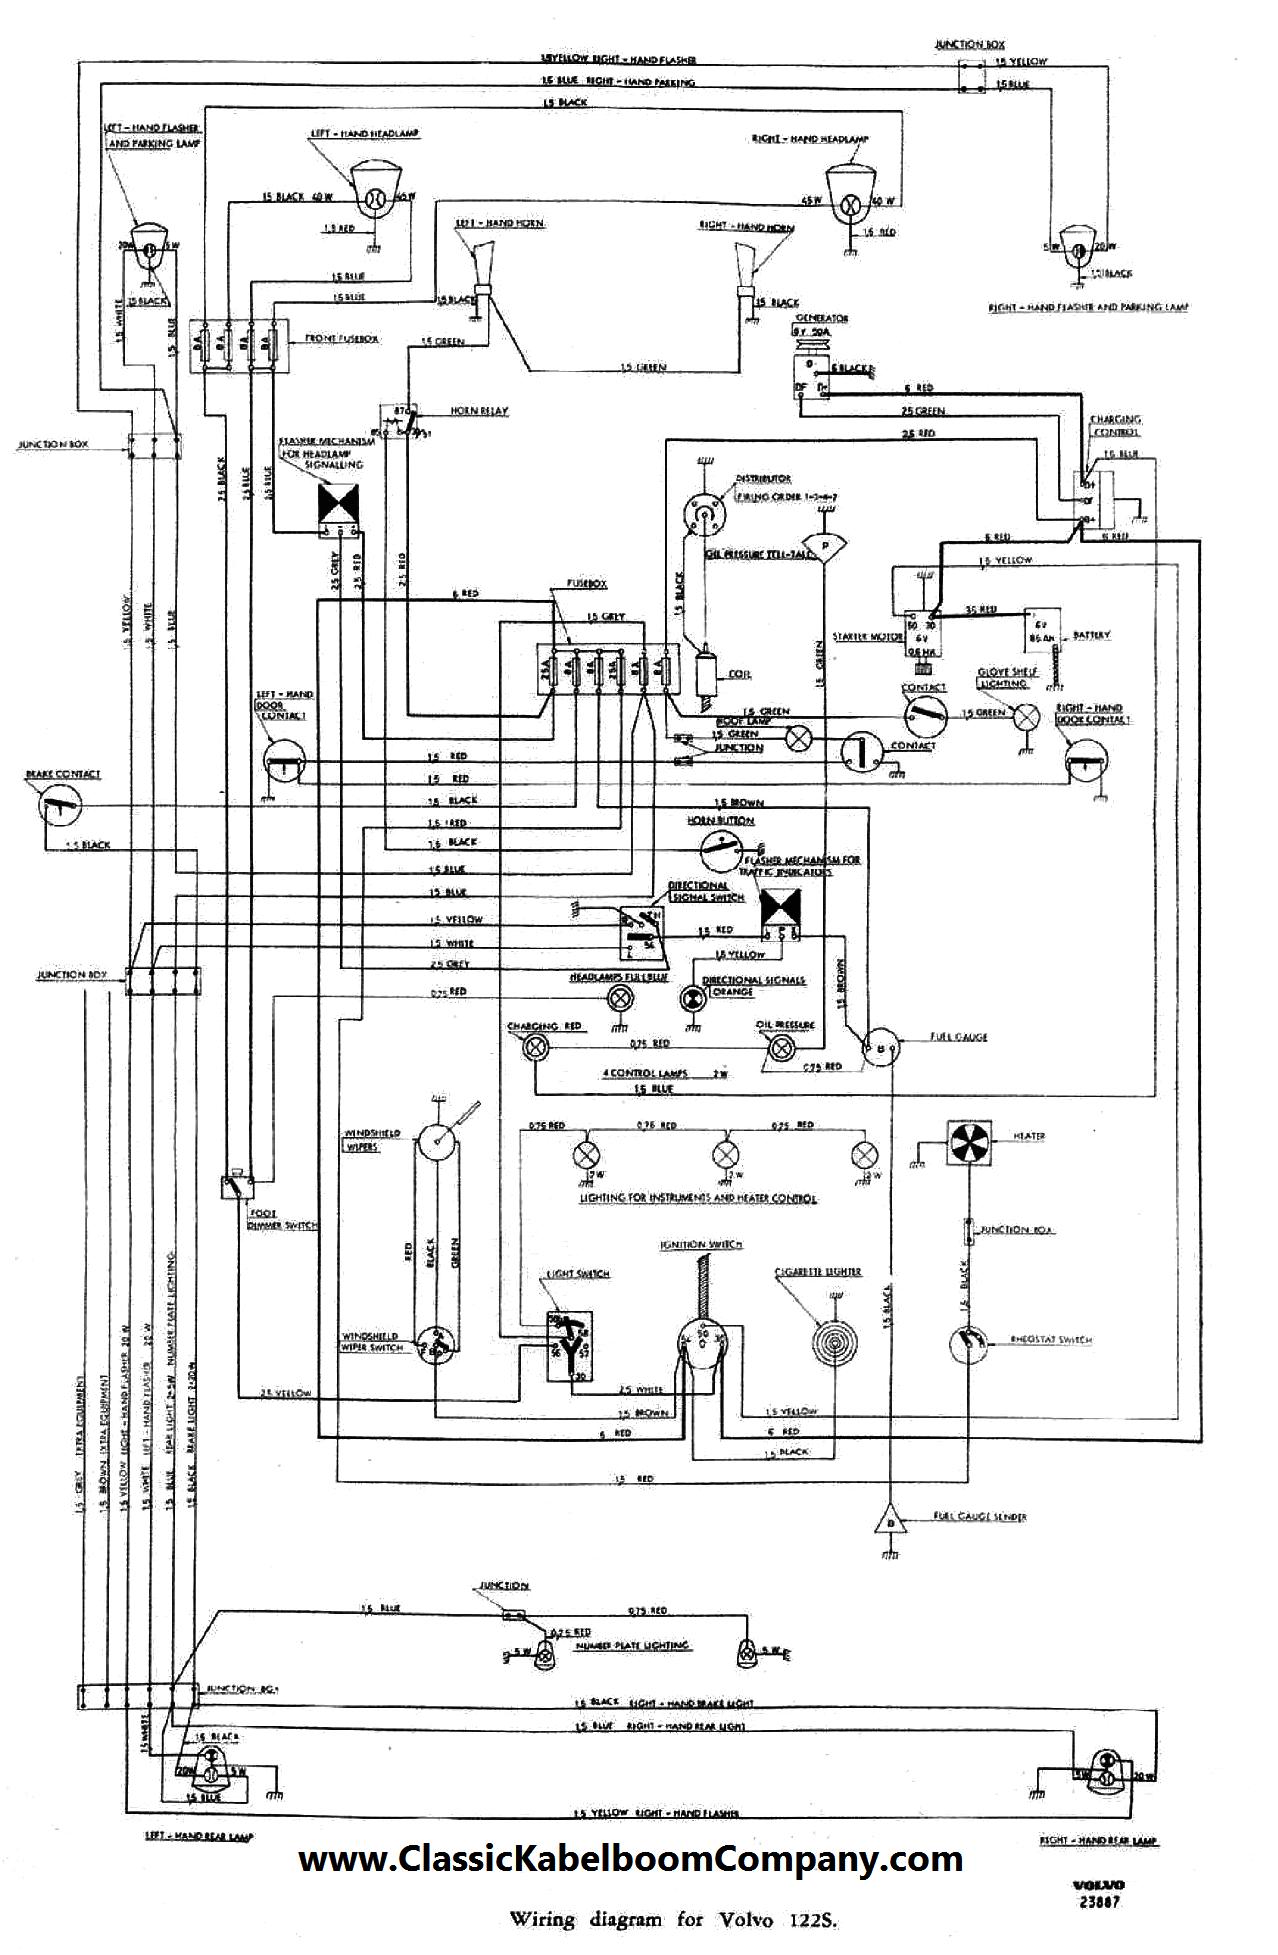 vol2?cdp=a classic kabelboom company elektrisch bedrading schema volvo 1977 Volvo 242 Stance at readyjetset.co